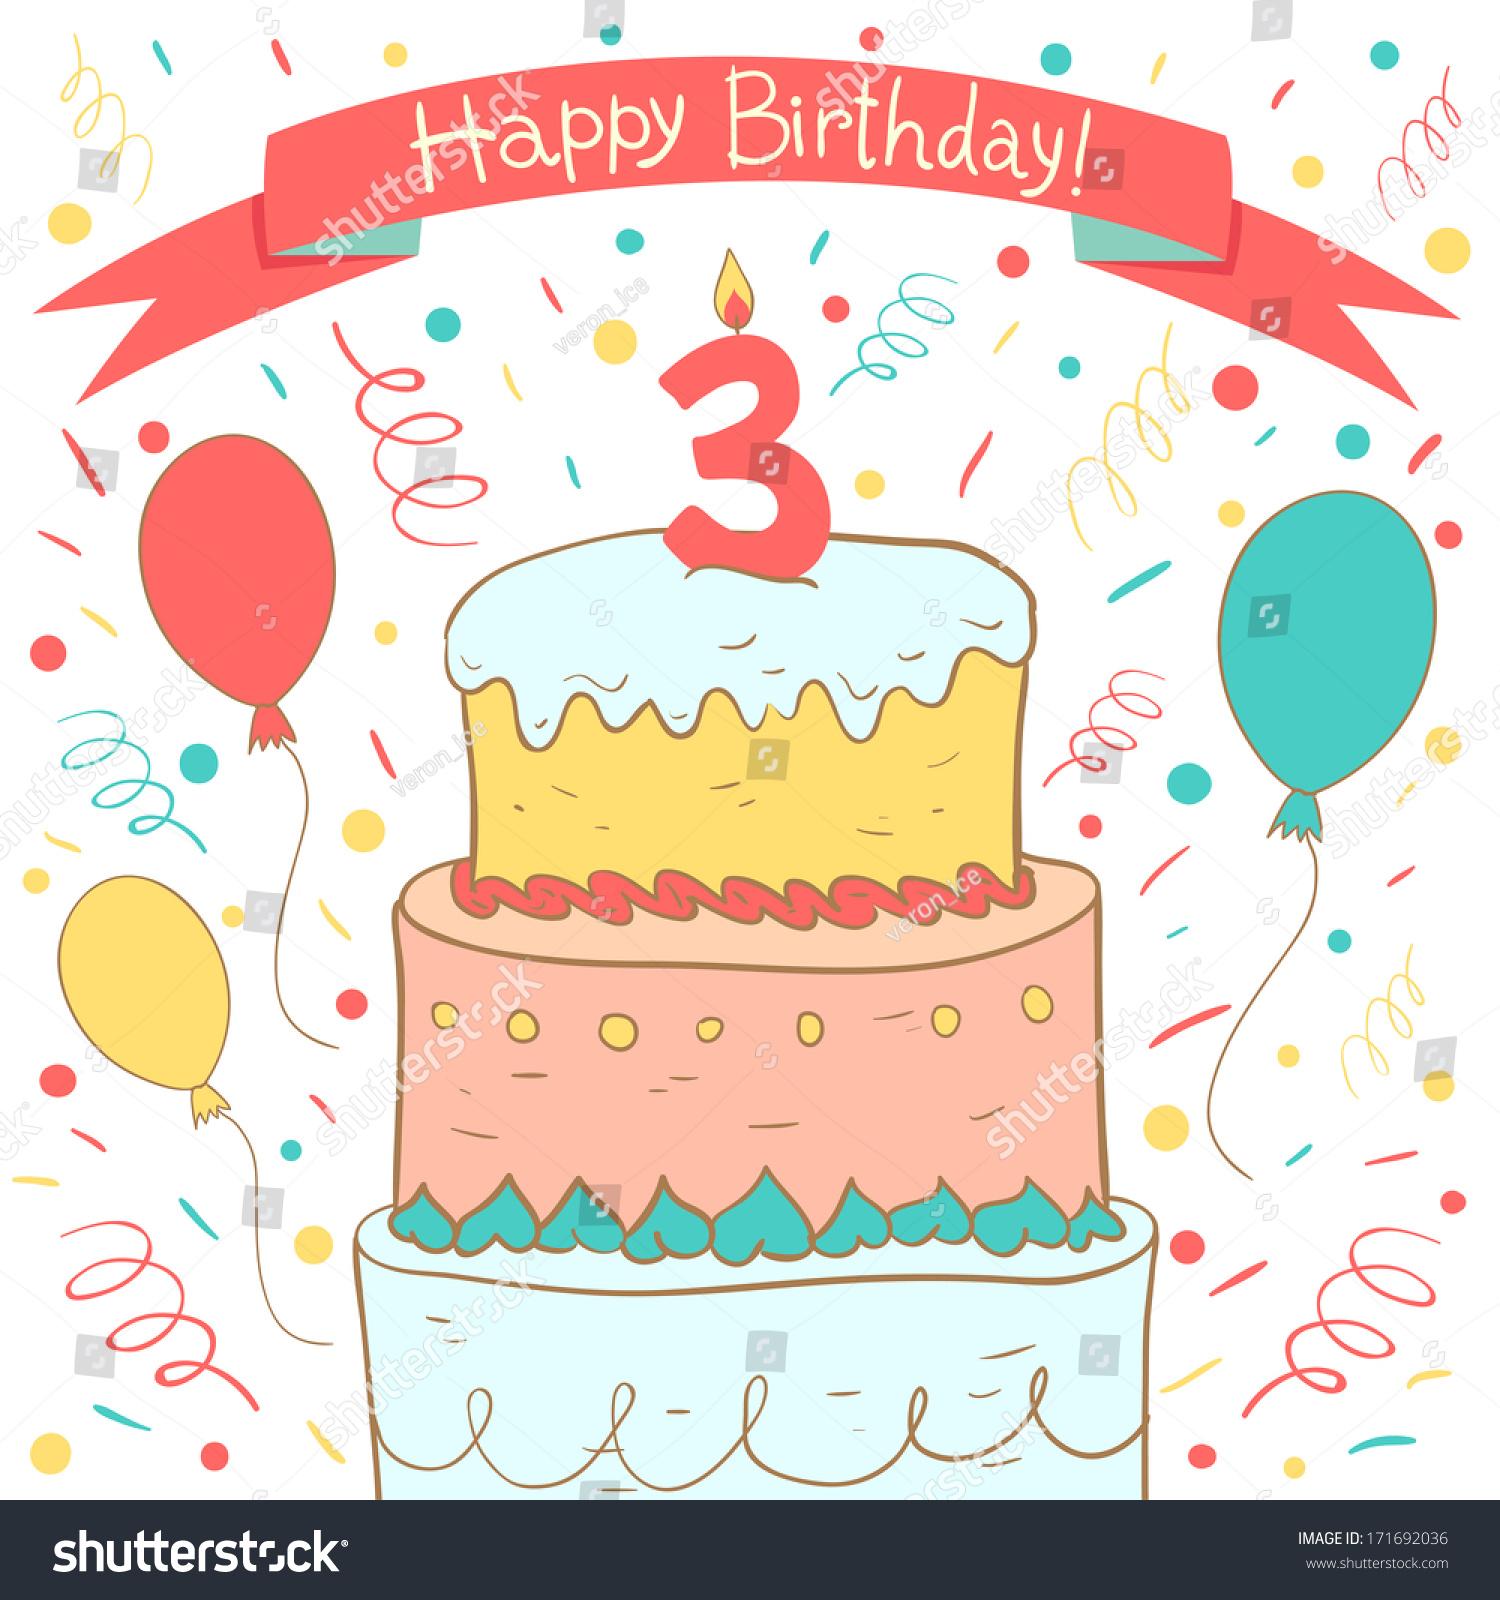 Cute Happy Birthday Card Birthday Cake Stock Vector Royalty Free